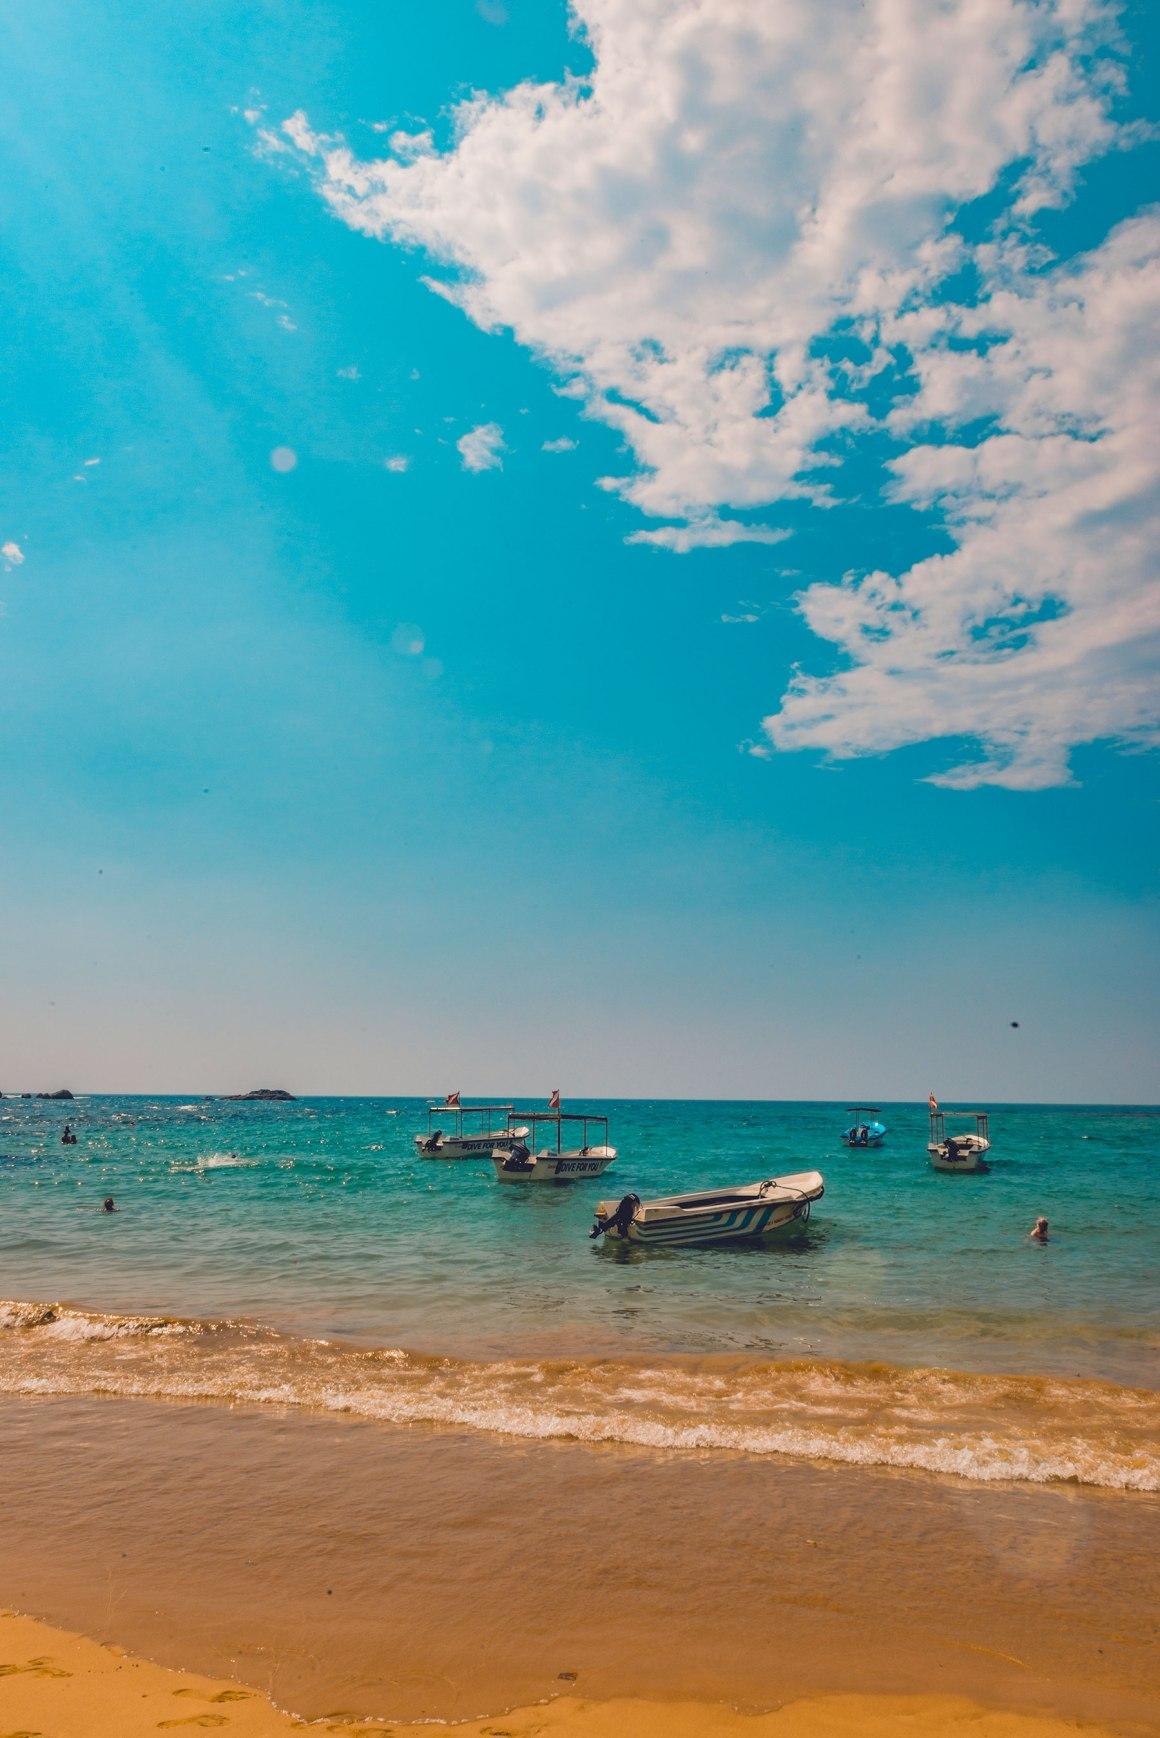 Naina.co, Naina Redhu, Sri Lanka, Hikkaduwa, Hikkaduwa Beach, Airbnb, Colombo, Photo shoot, Photography, EyesForDestinations, Photographer, Photo Blogger, Photo Blogger India, Photographer India, Professional Photographer India, Lifestyle Photographer, Lifestyle Blogger, Travel Photographer India, Travel Photographer, Travel Blogger, Beach Vacation, Sri Lanka Vacation, Hikkaduwa Vacation, Sri Lankan Cuisine, Rice Curry, Swimming Pool, Dogs, Salt Water, Railway Crossing, Home Grown, Refresh, Supermarket, Sunsets, Hikkaduwa Sunsets, Sri Lanka Sunsets, Colombo Airport, Air India, Relaxing Vacation, EyesForSriLanka, South East Asia, Asia, EyesForAsia